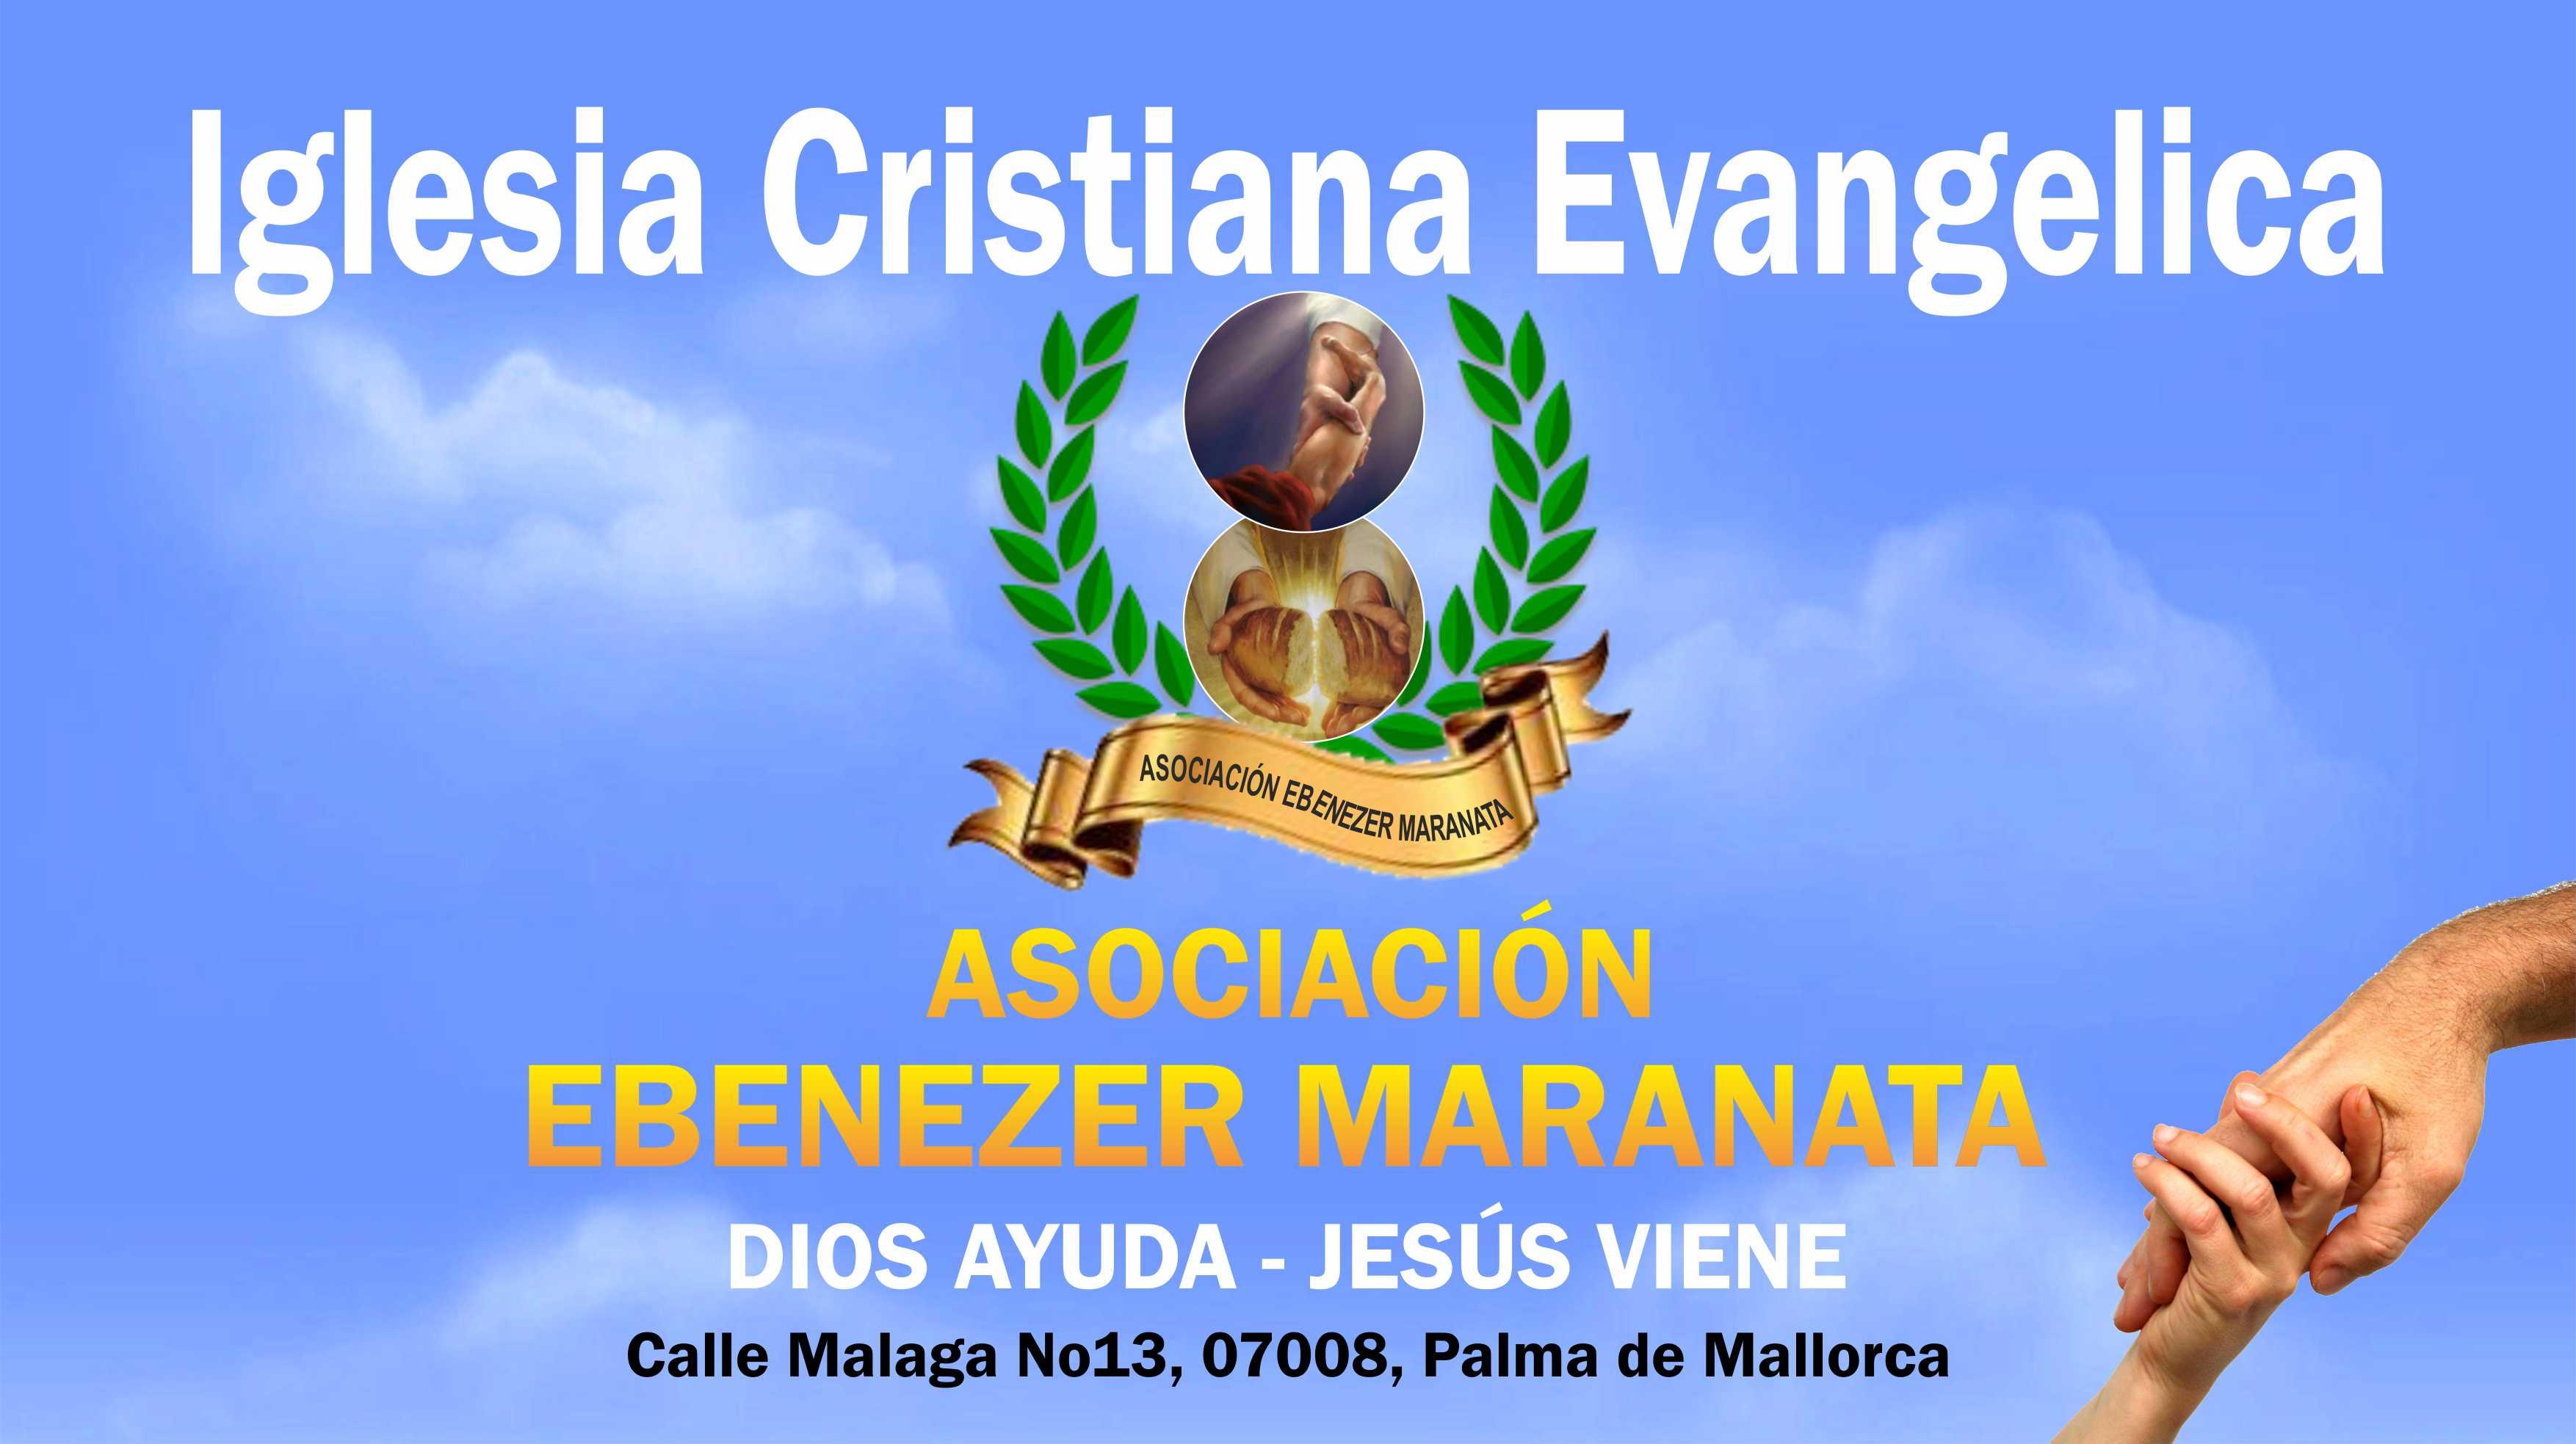 Ebenezer Maranata